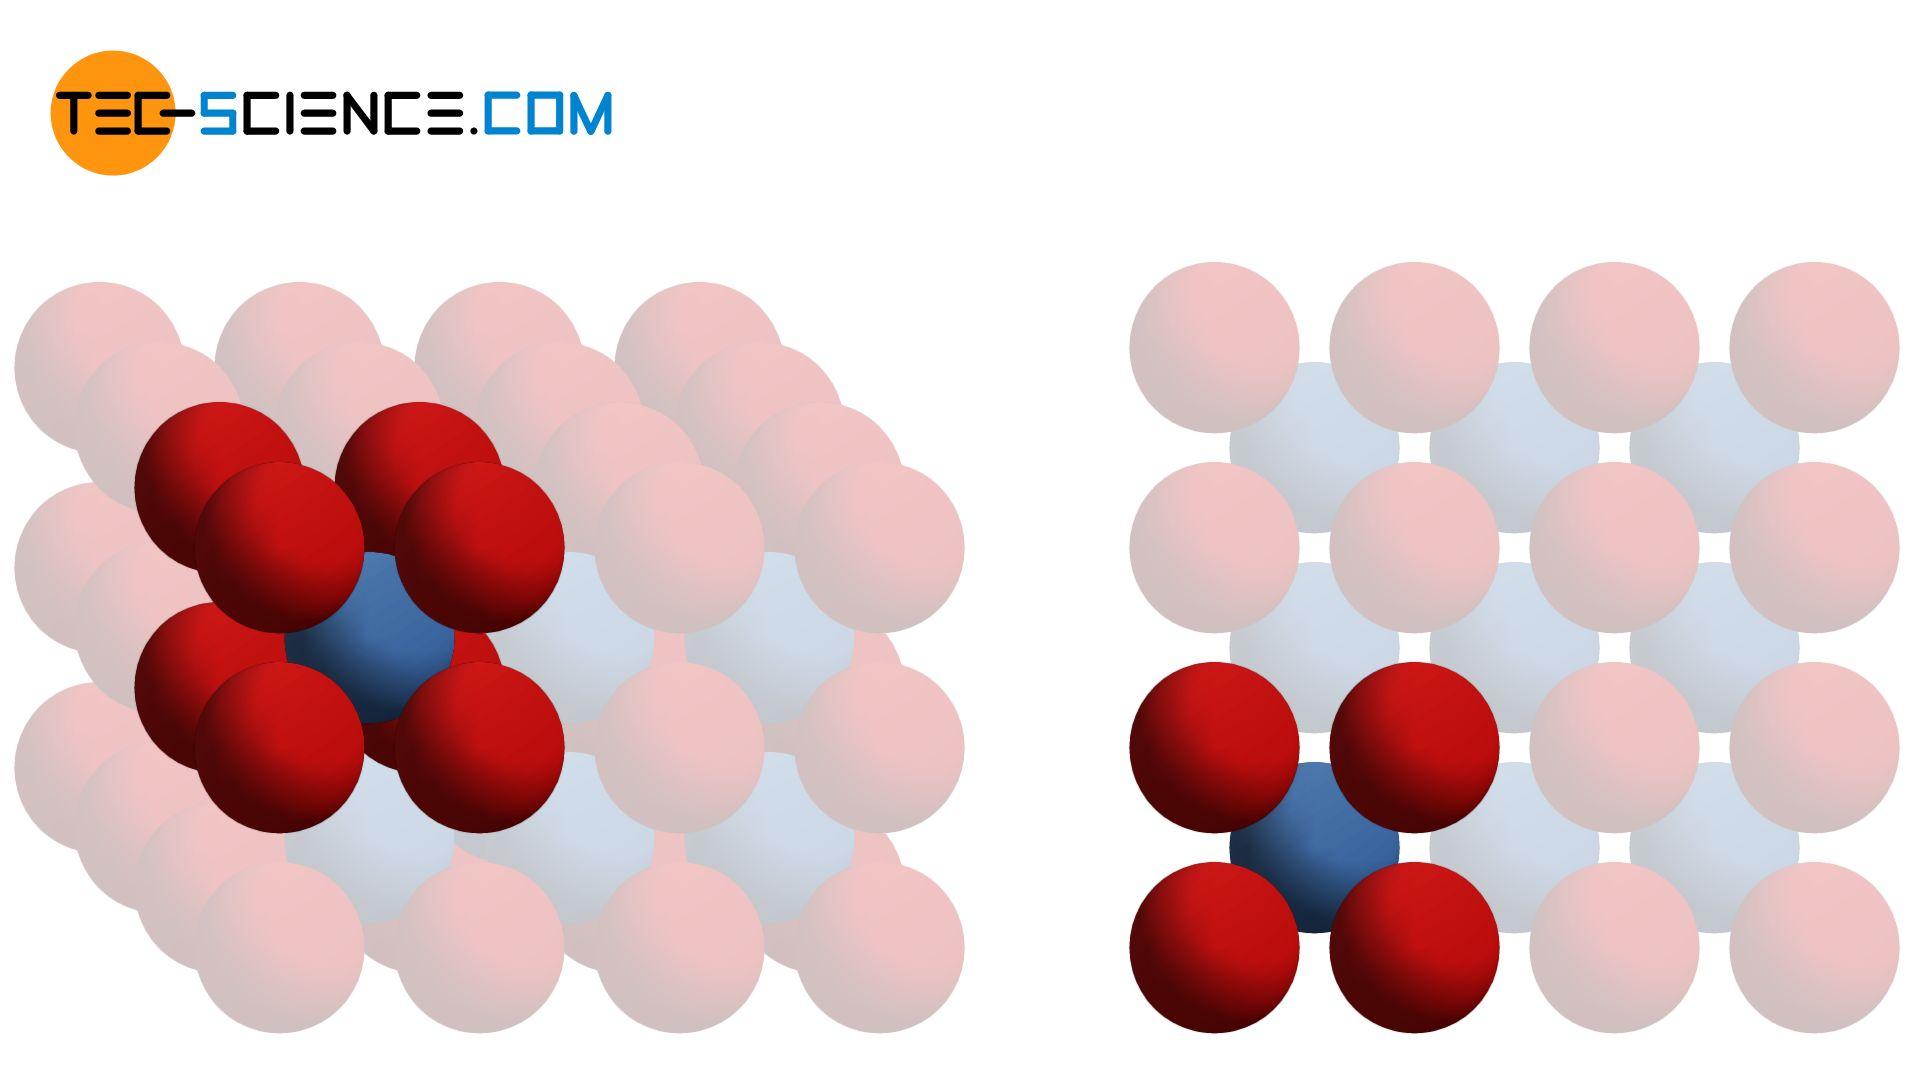 Body-centered cubic (bcc) lattice structure (unit cell)